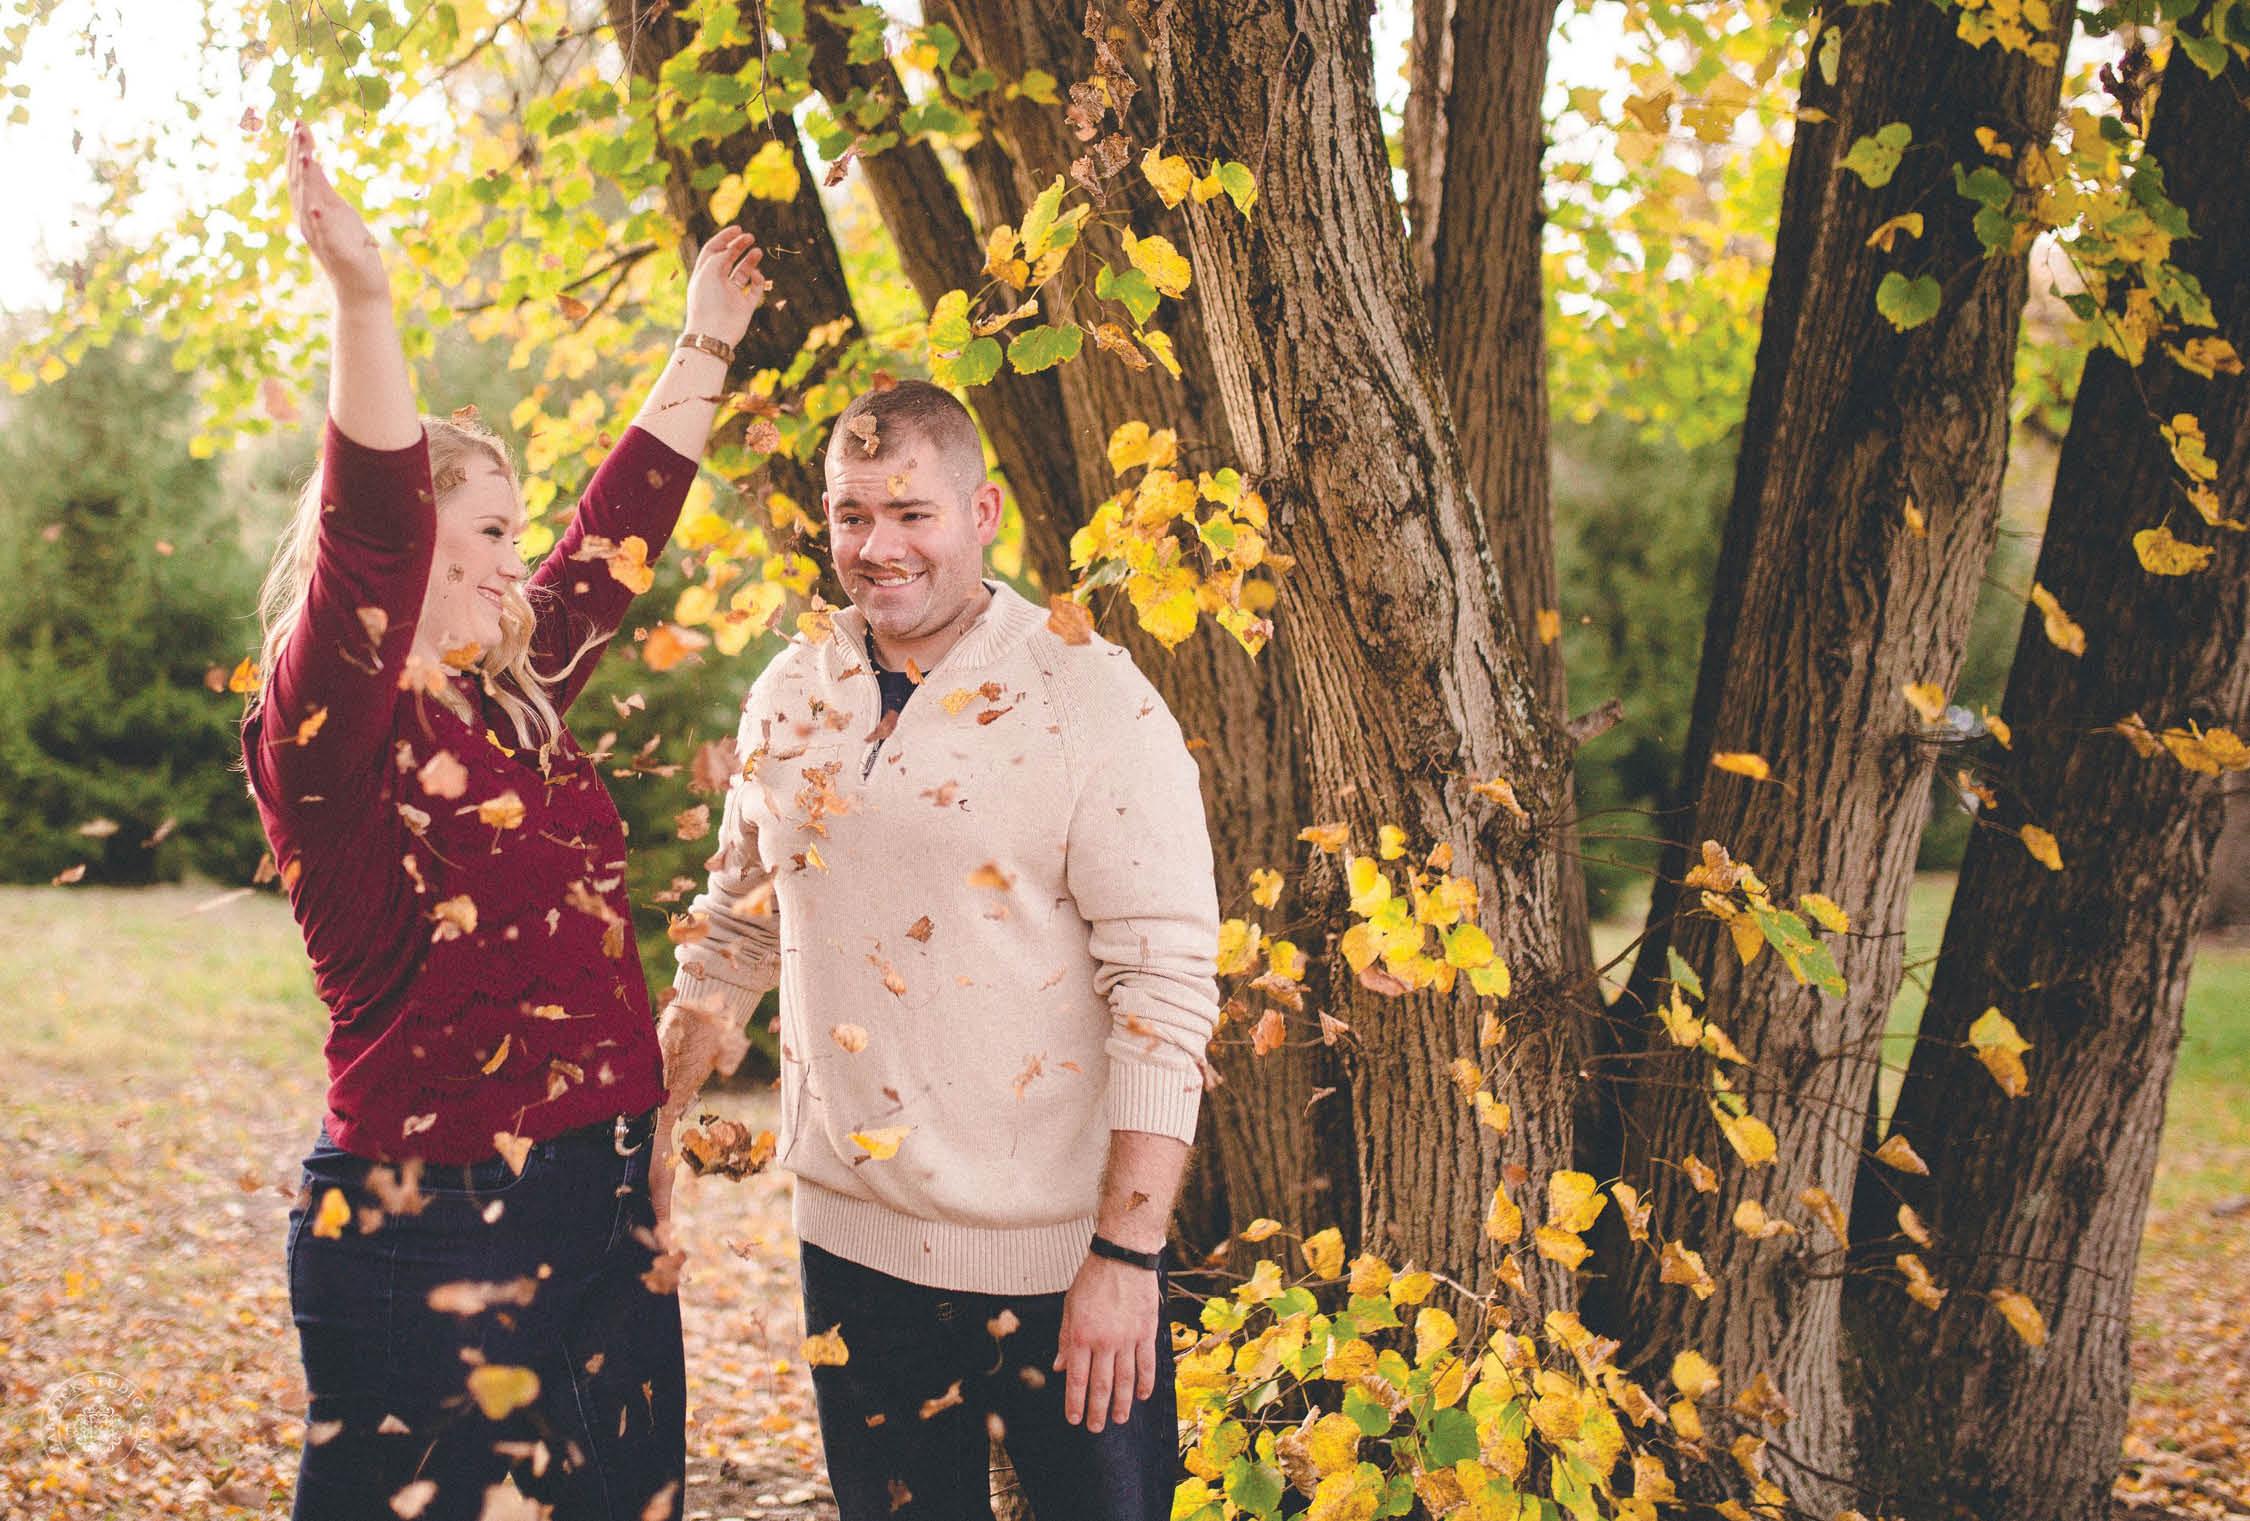 sarah-justin-engagement-photographer-dayton-ohio-7.jpg